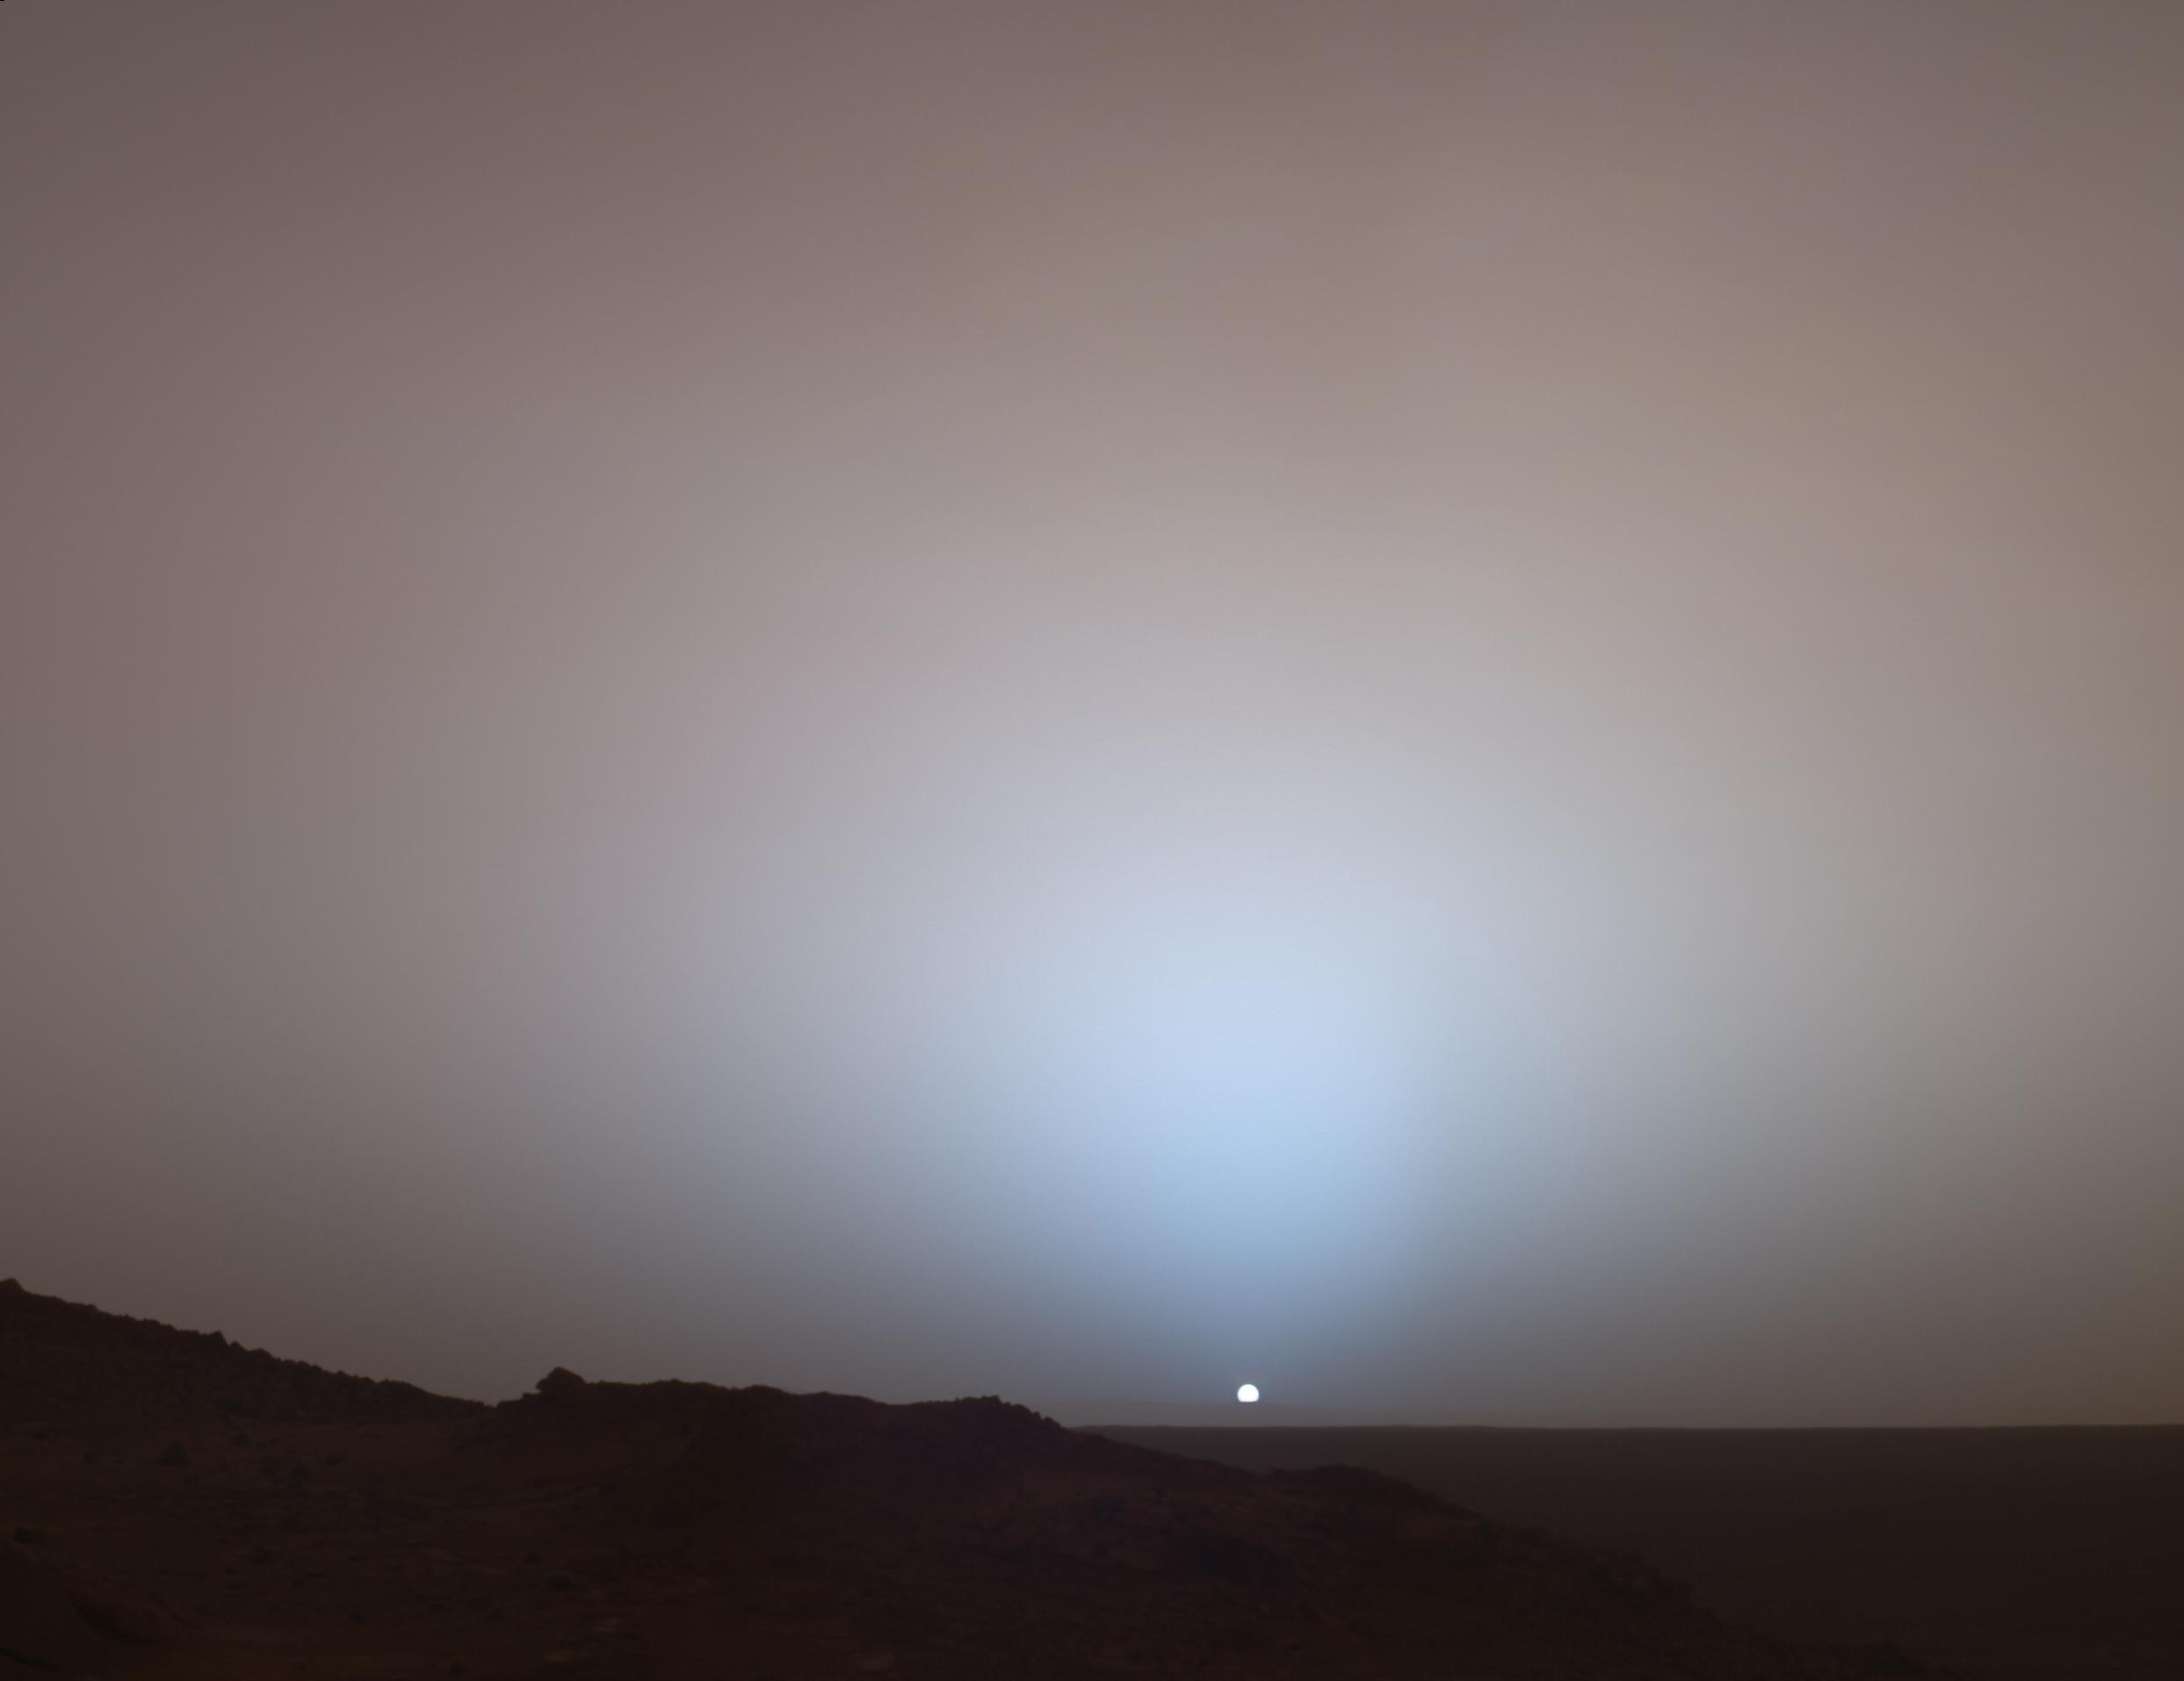 Sunset on Mars. Image credit: NASA/JPL/Texas A&M/Cornell